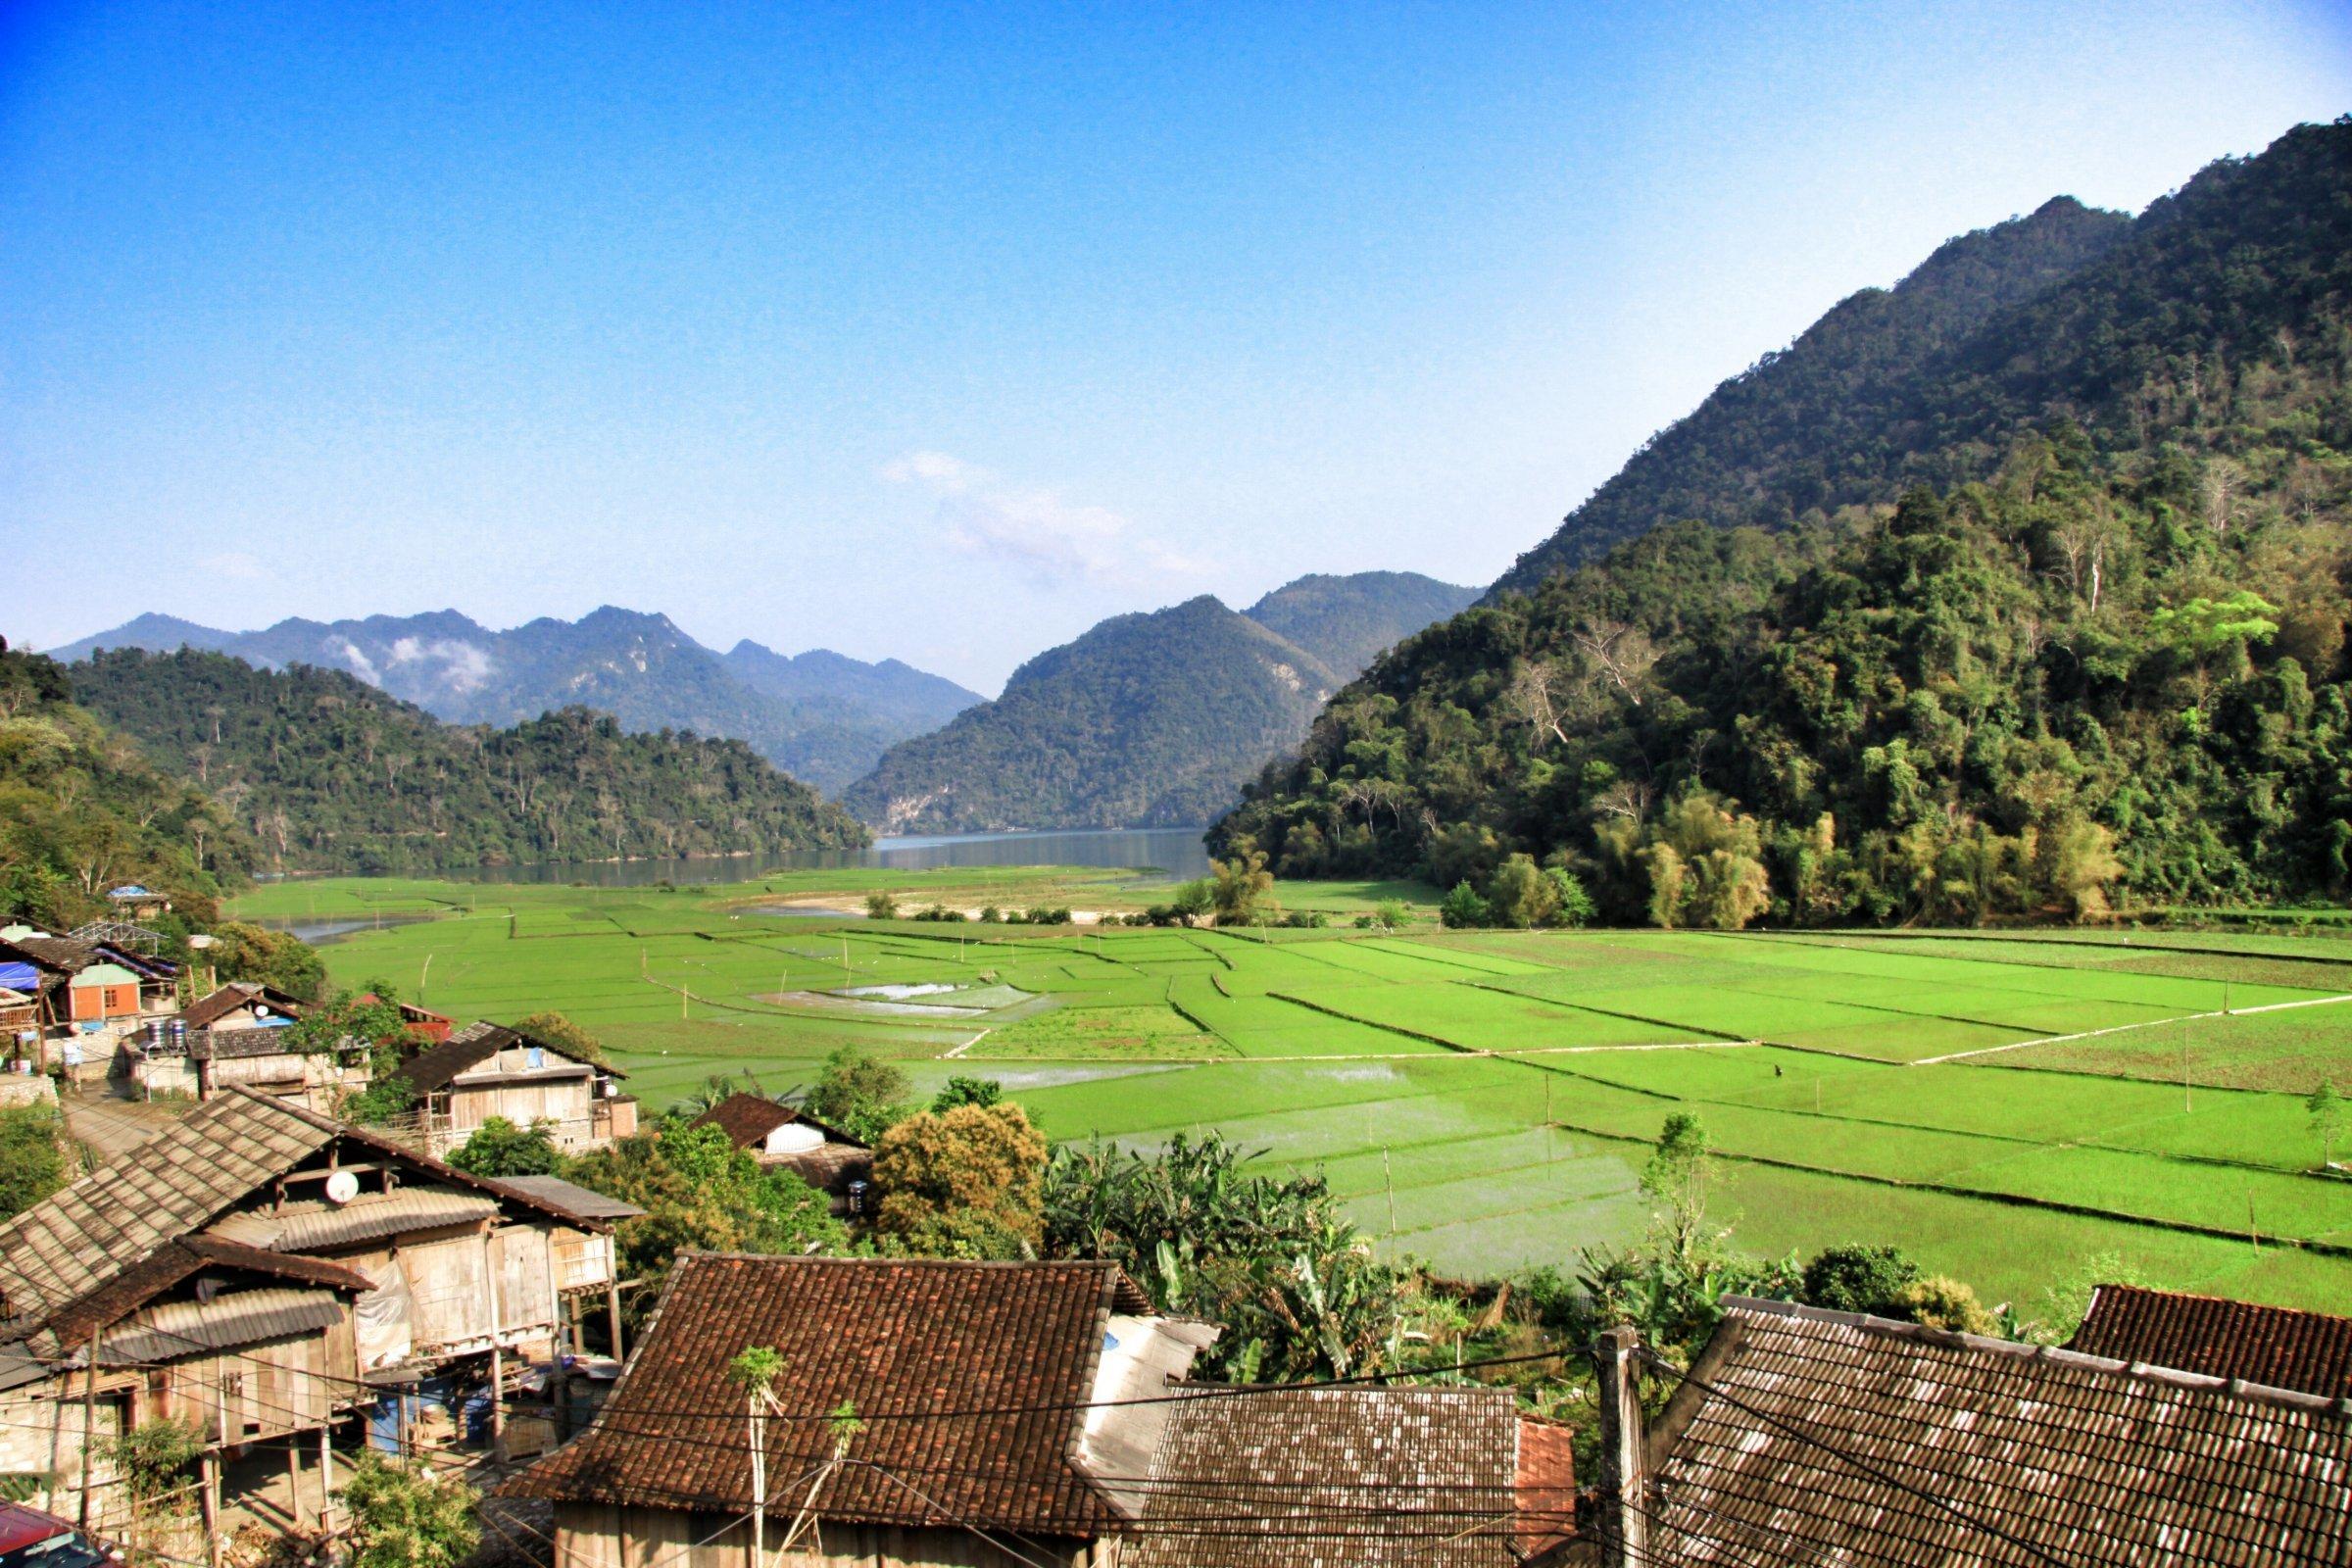 3-Day Waterfalls, Caves and Lakes - Vietnam Itinerary